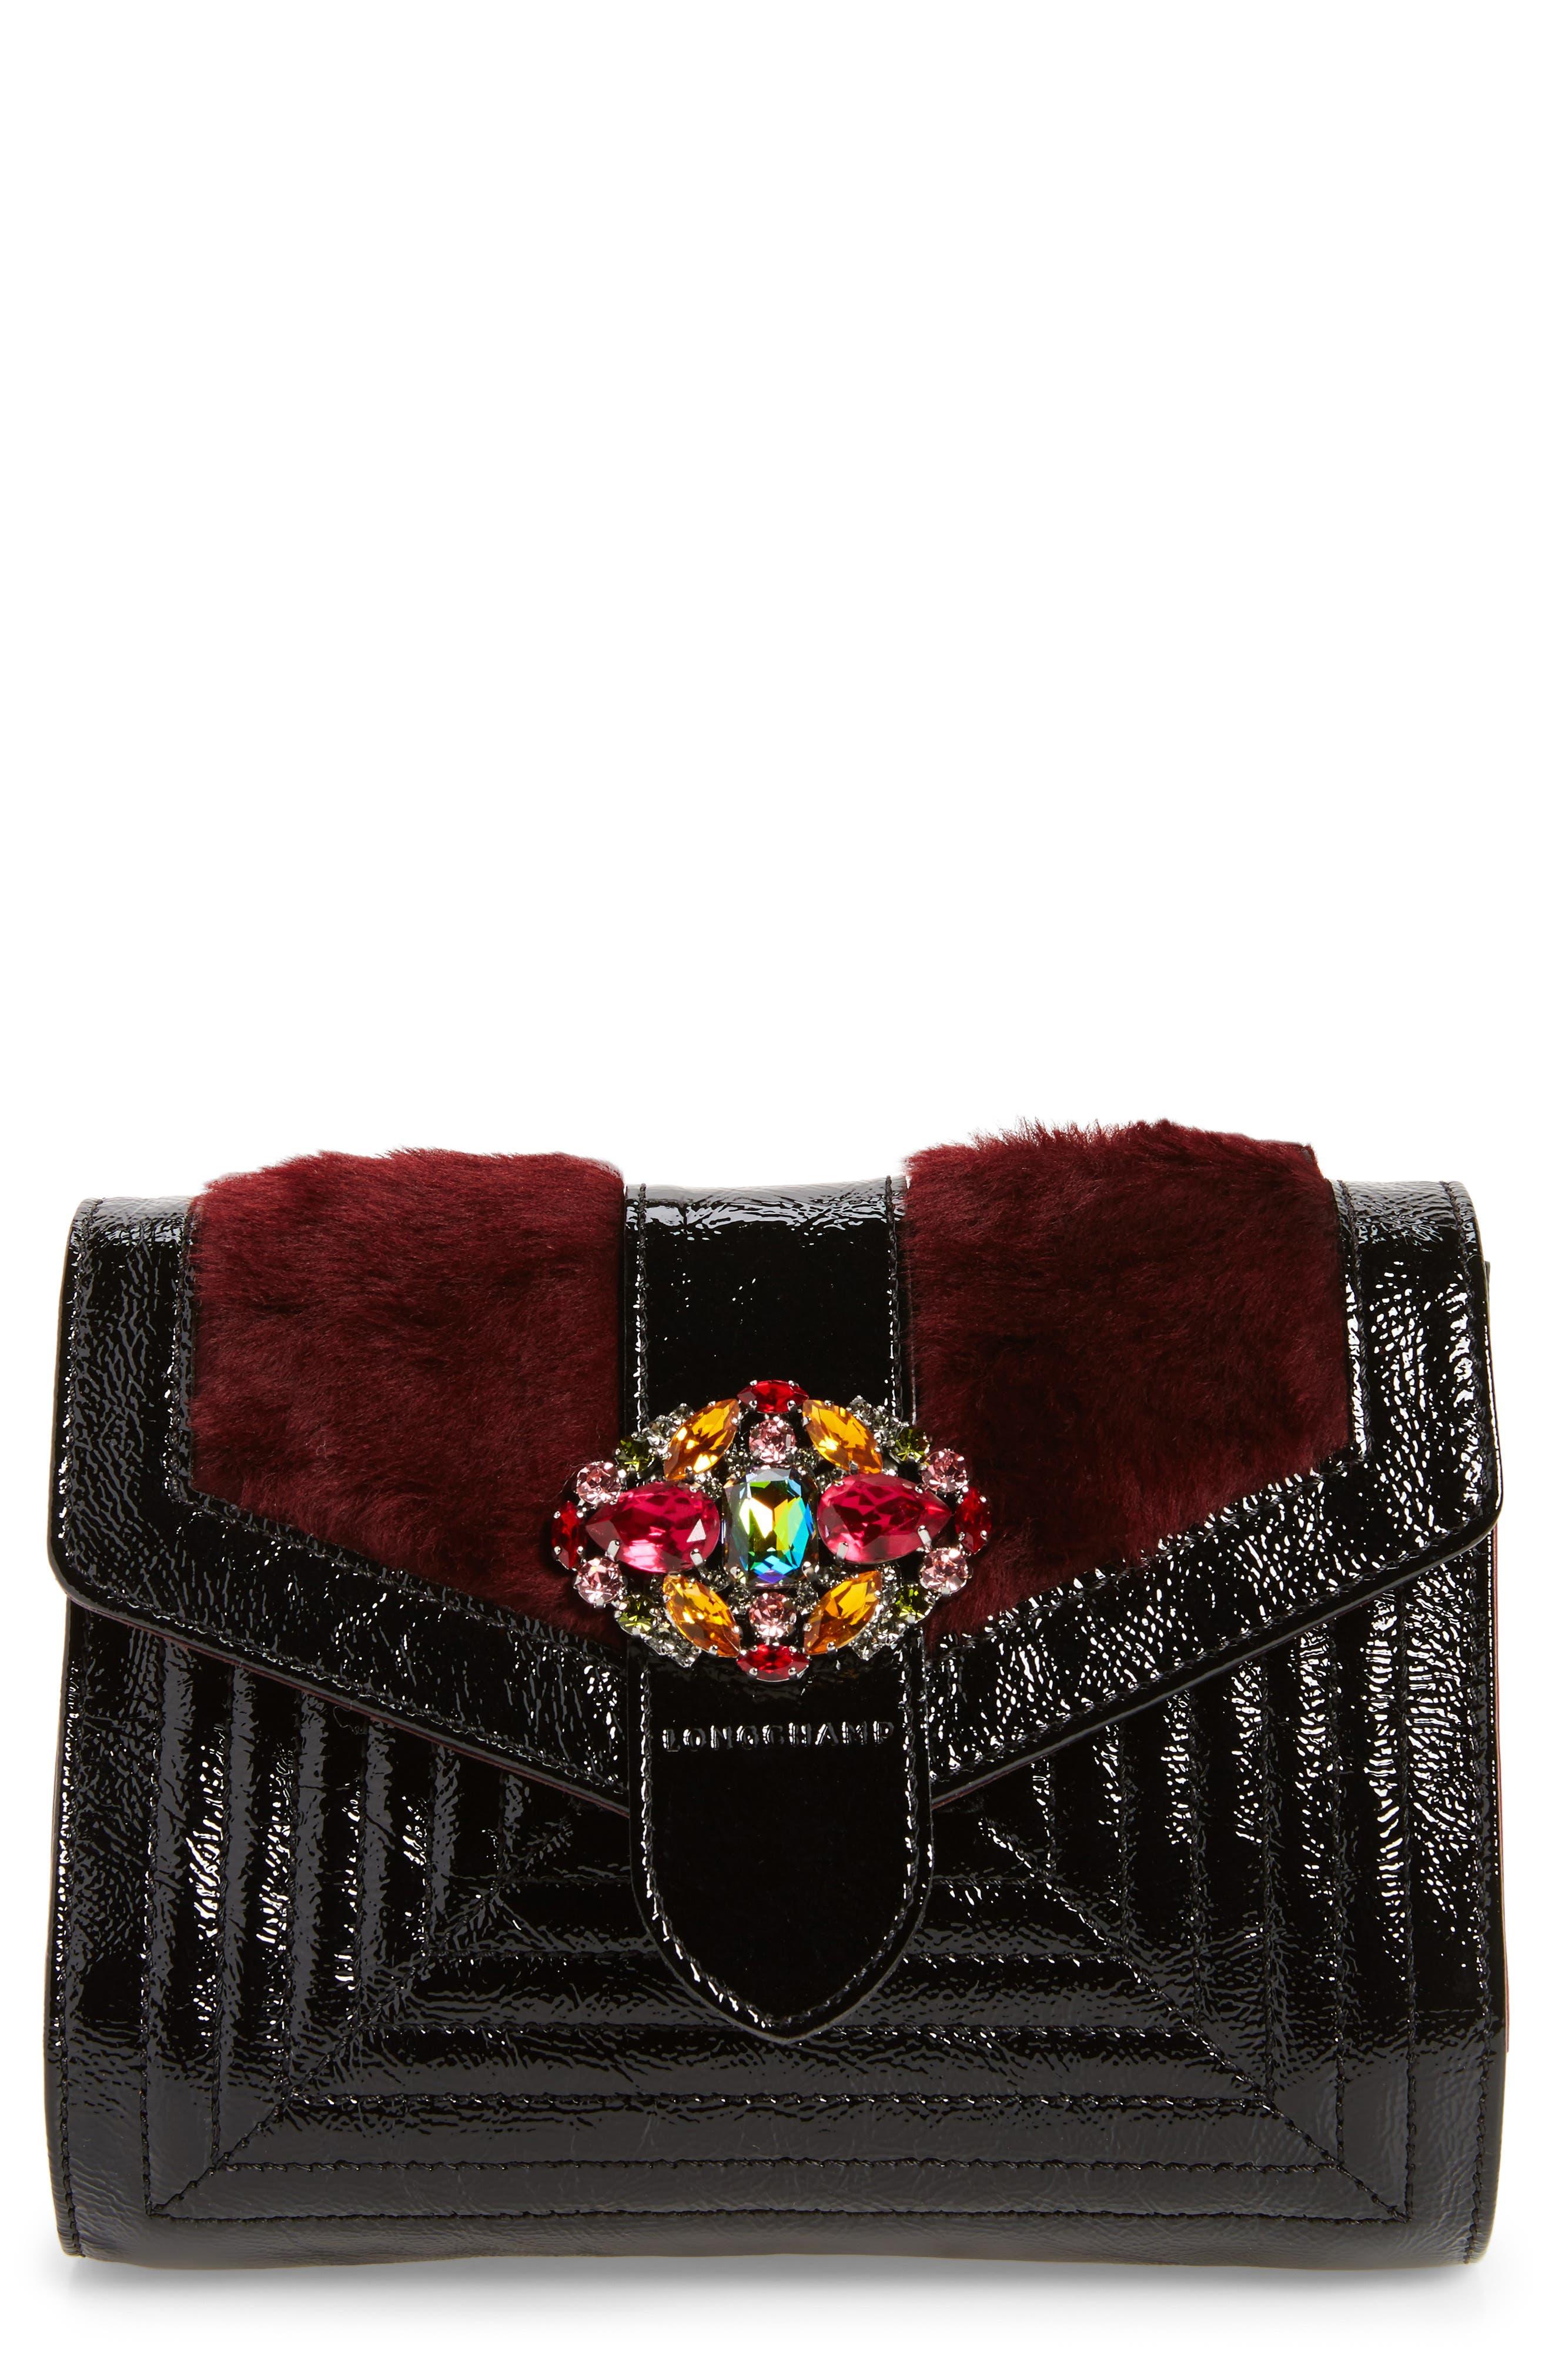 La Baronne Genuine Shearling Trim Leather Clutch,                         Main,                         color,